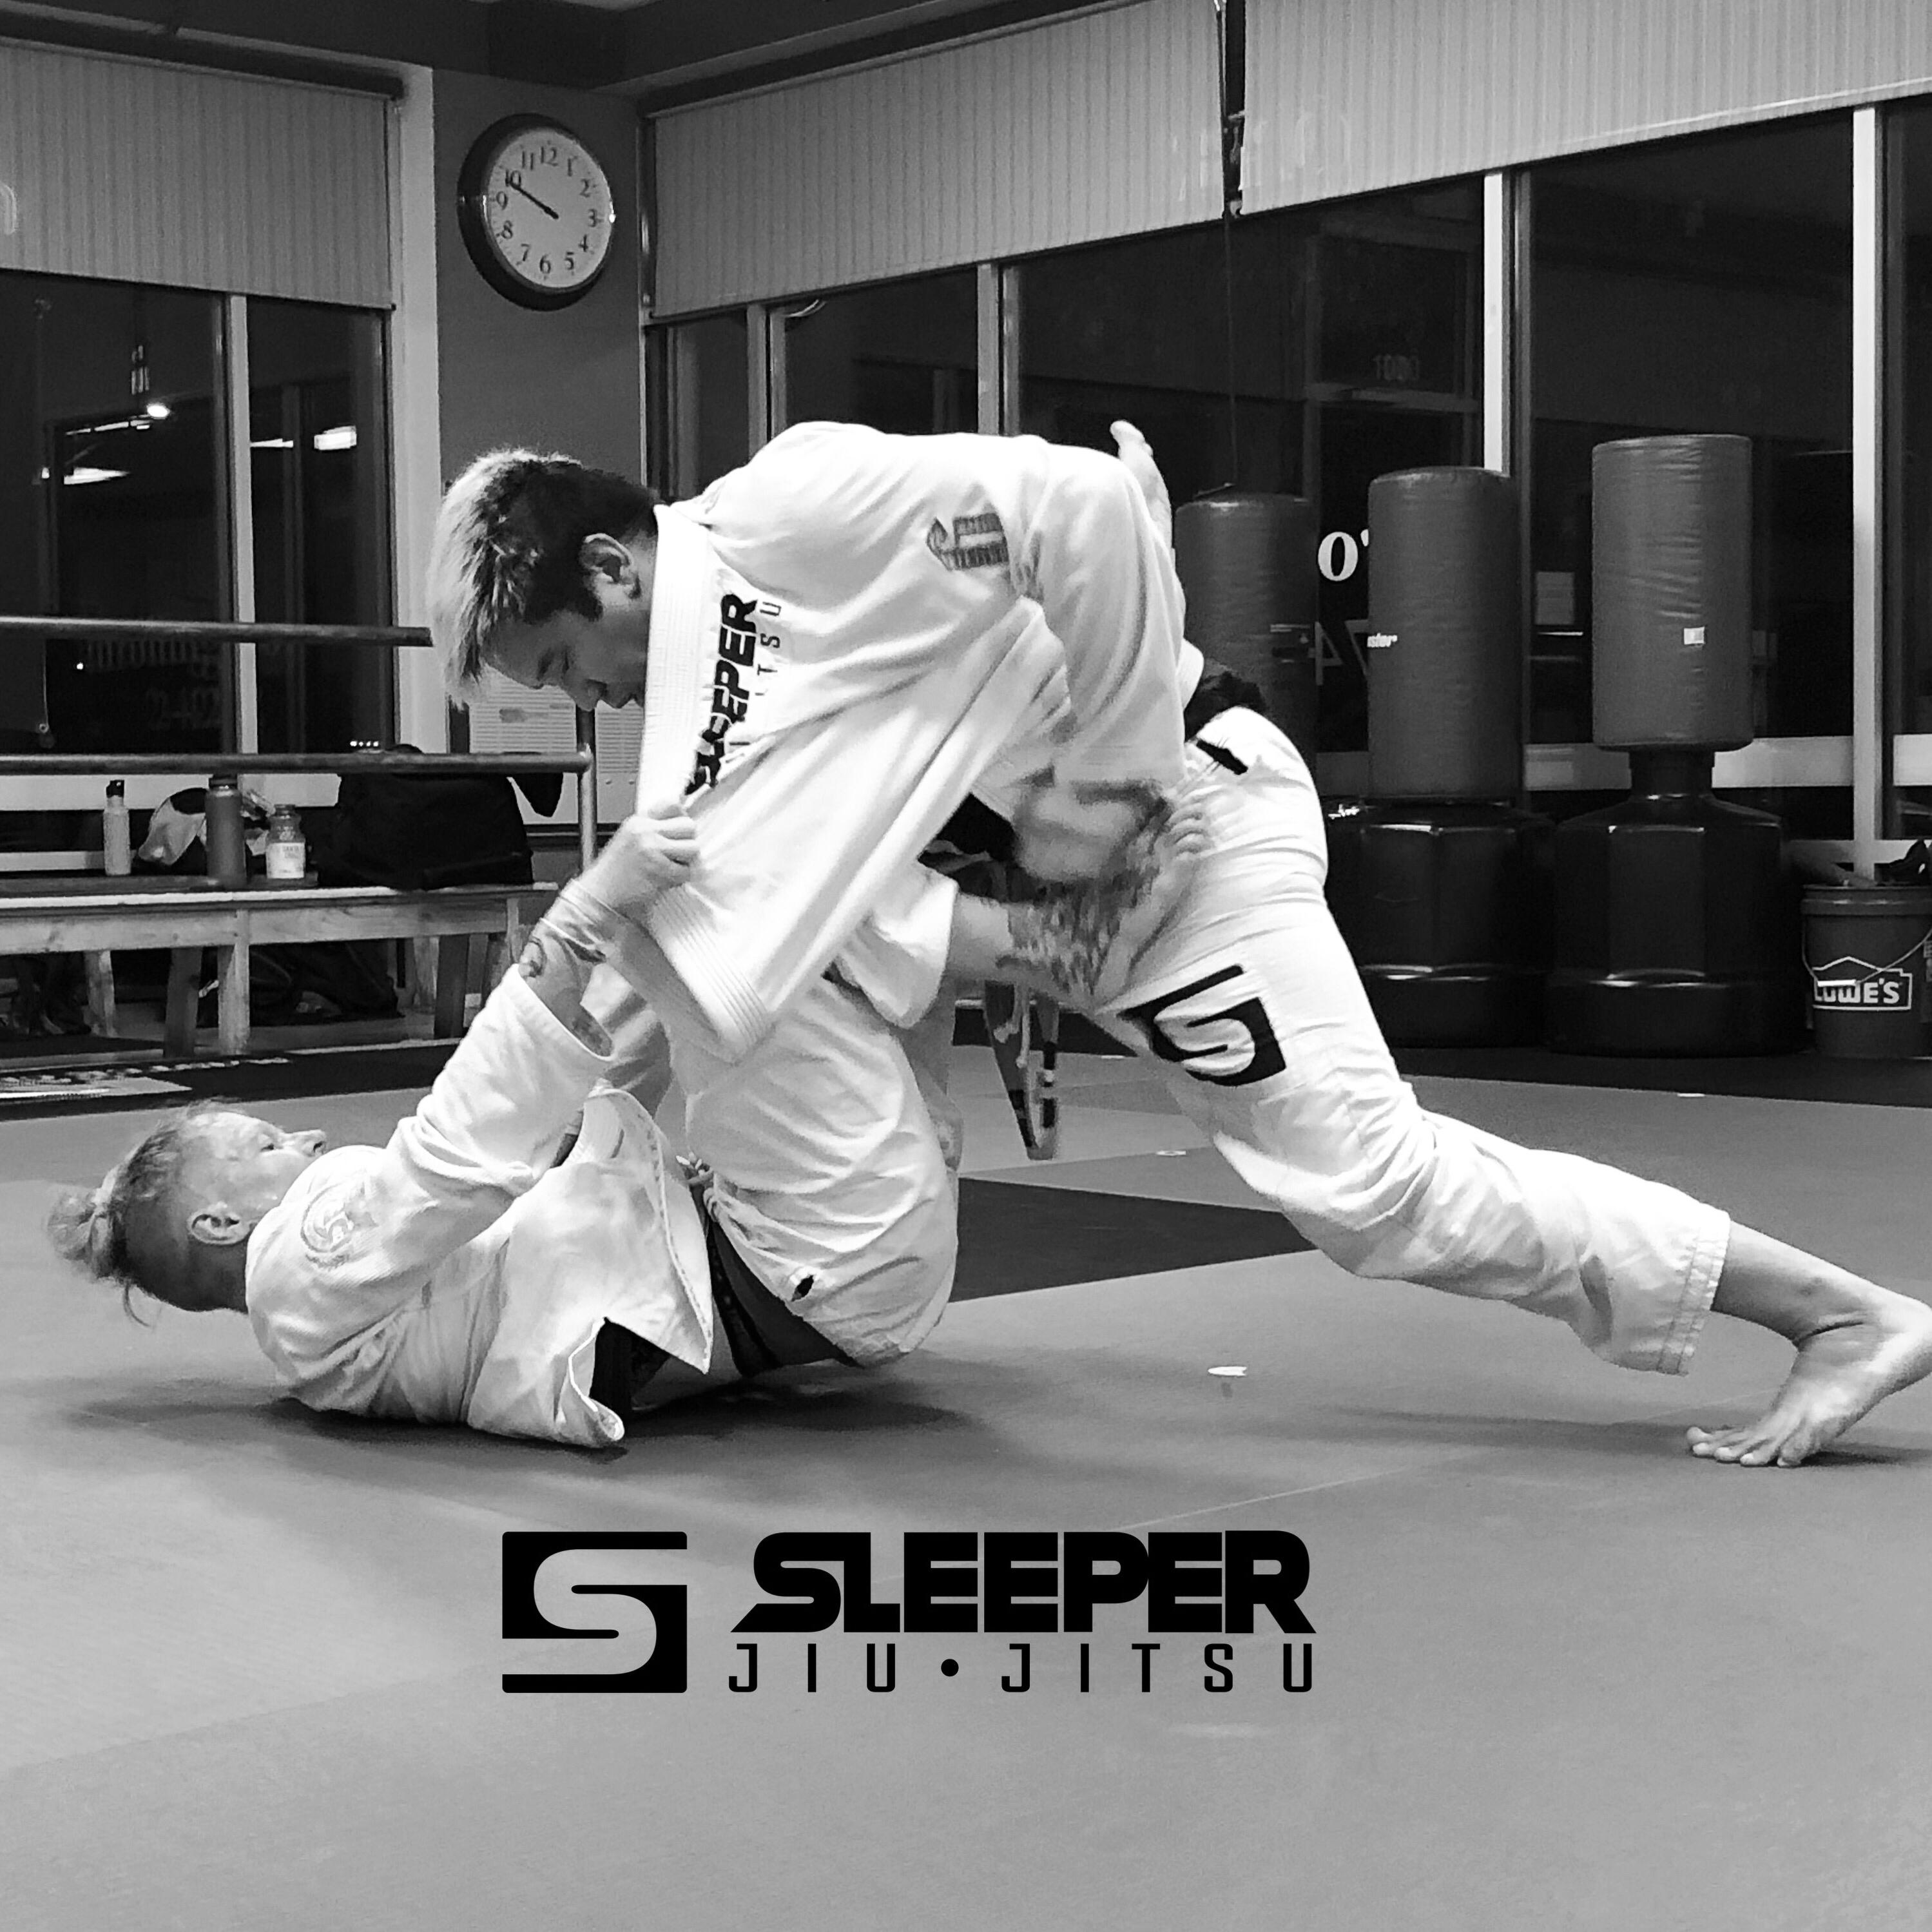 Sleeper Jiu Jitsu